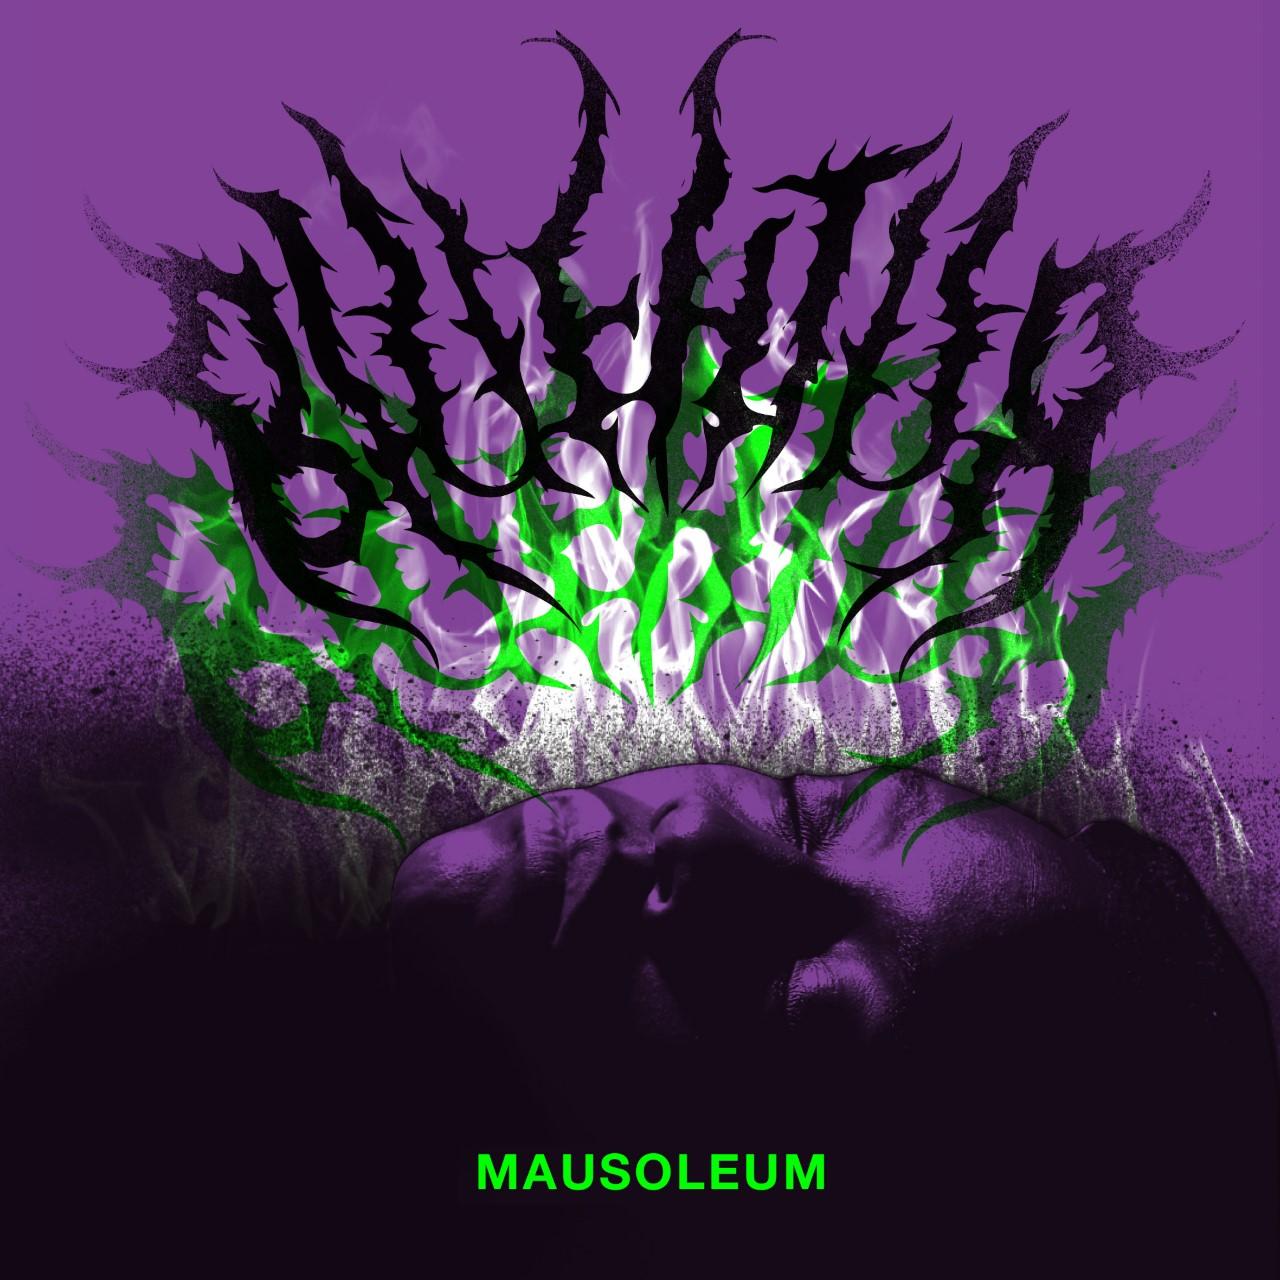 Blue Ruth - Mausoleum EP (digital download)